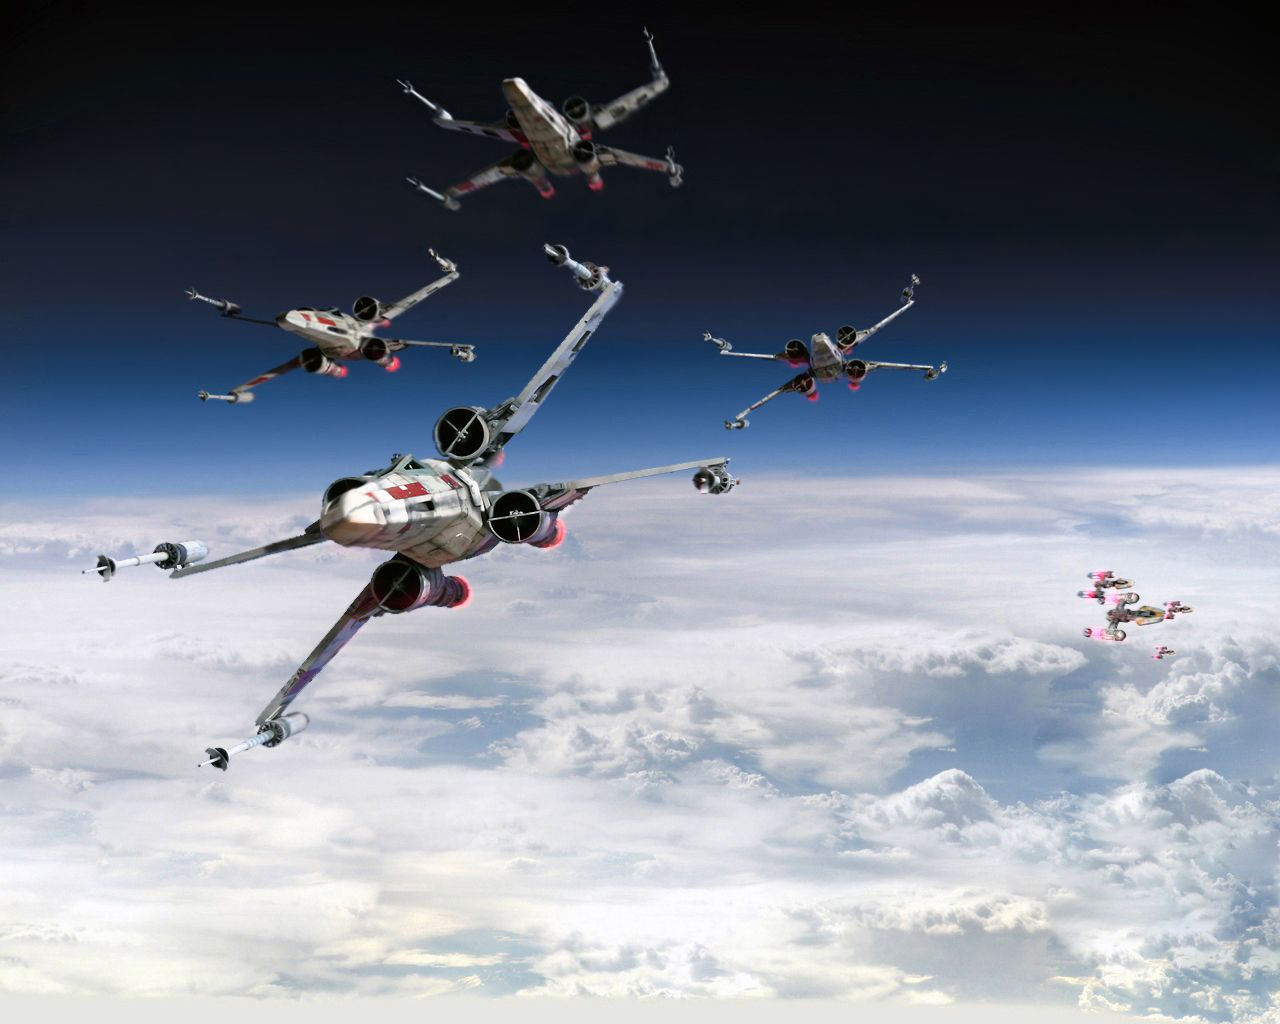 Rogue Squadron By 1darthvader On Deviantart Star Wars Wallpaper Star Wars Ships Star Wars Poster